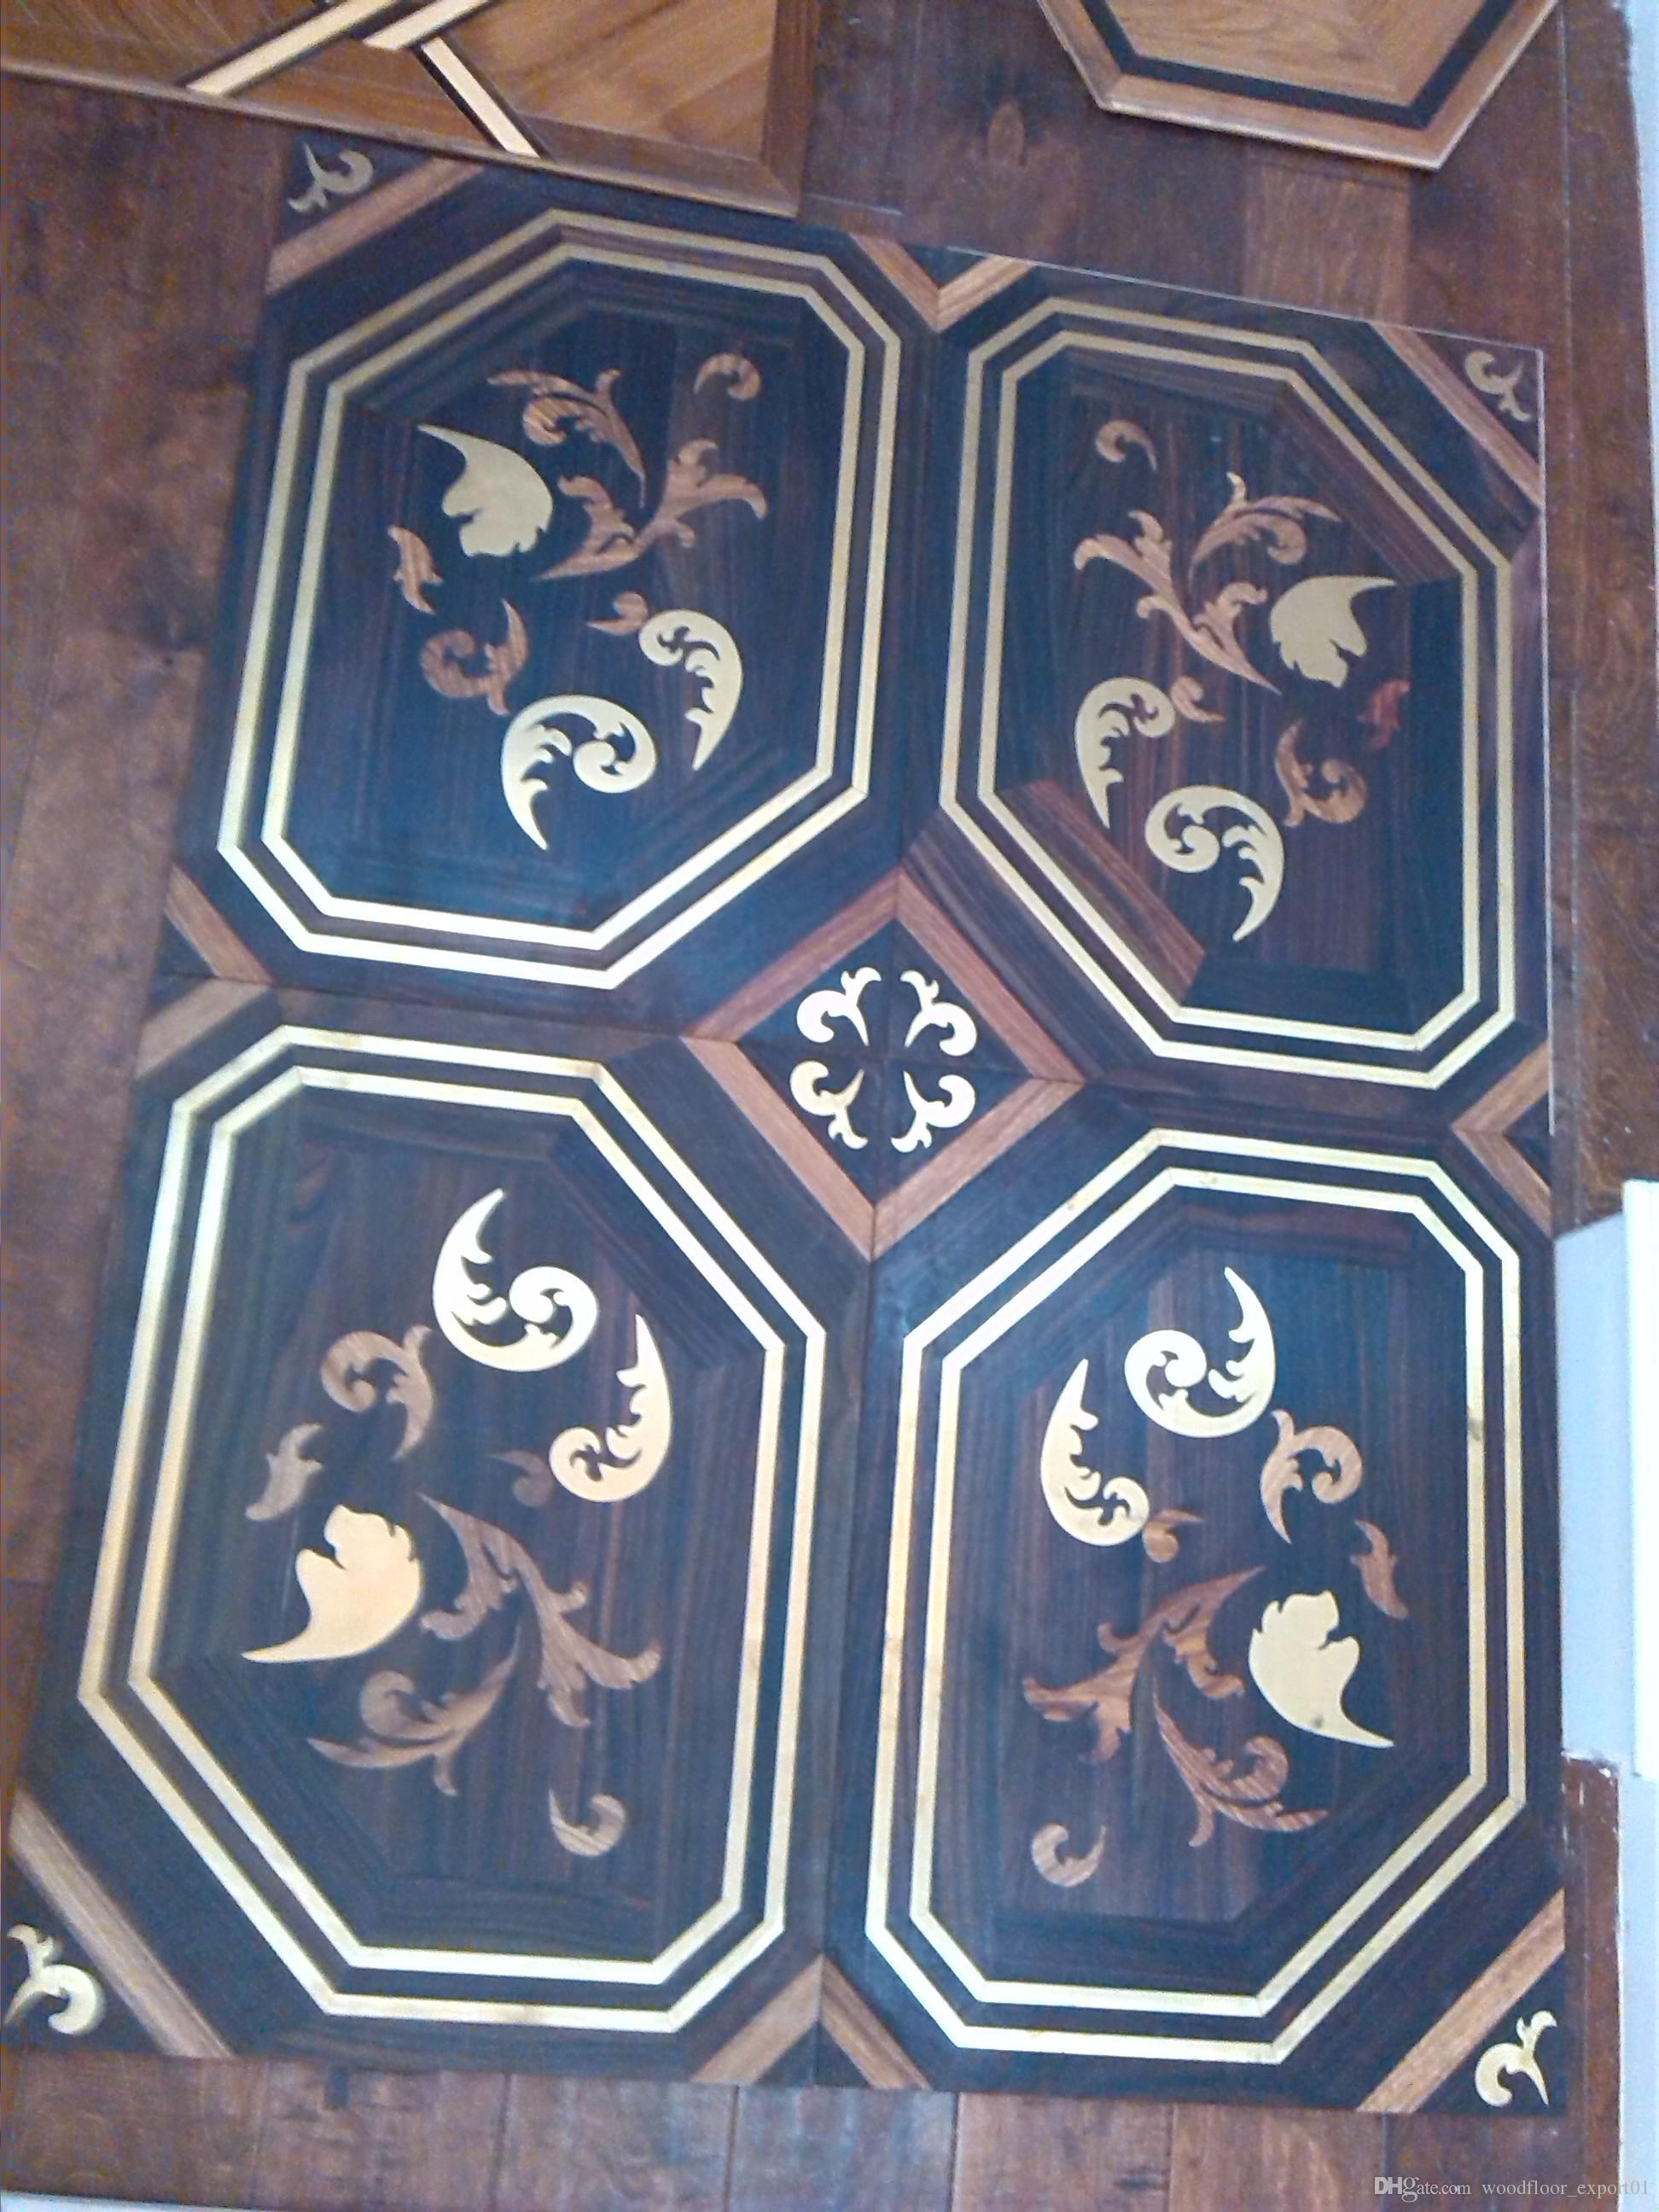 Mosaic floor Combinat Design House floor Jade inlaid wood floor Shell wood flooring Oak floor Floor finishes customPrivate custom wood floor